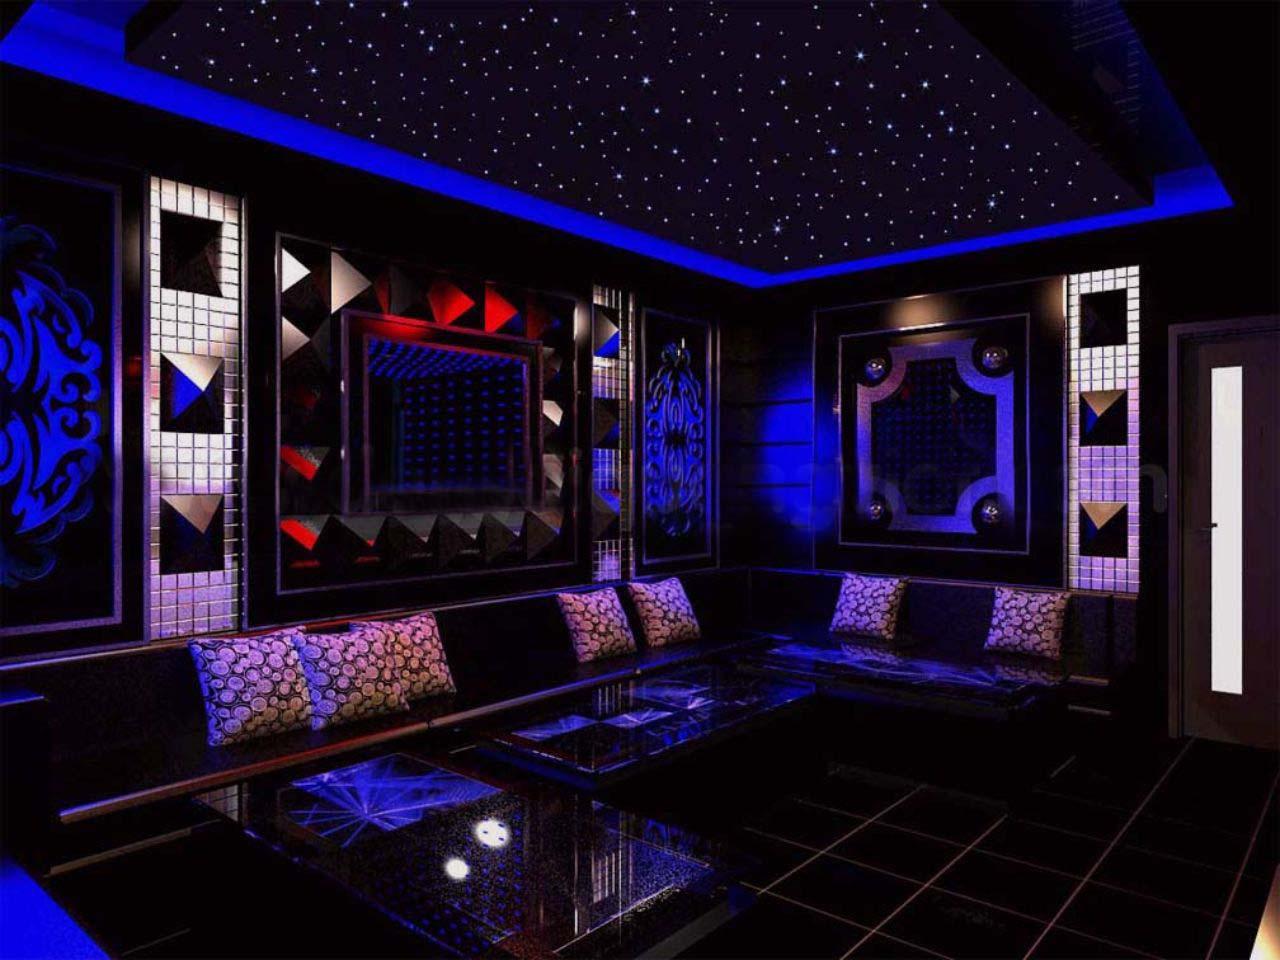 thiết kế phòng karaoke luxury